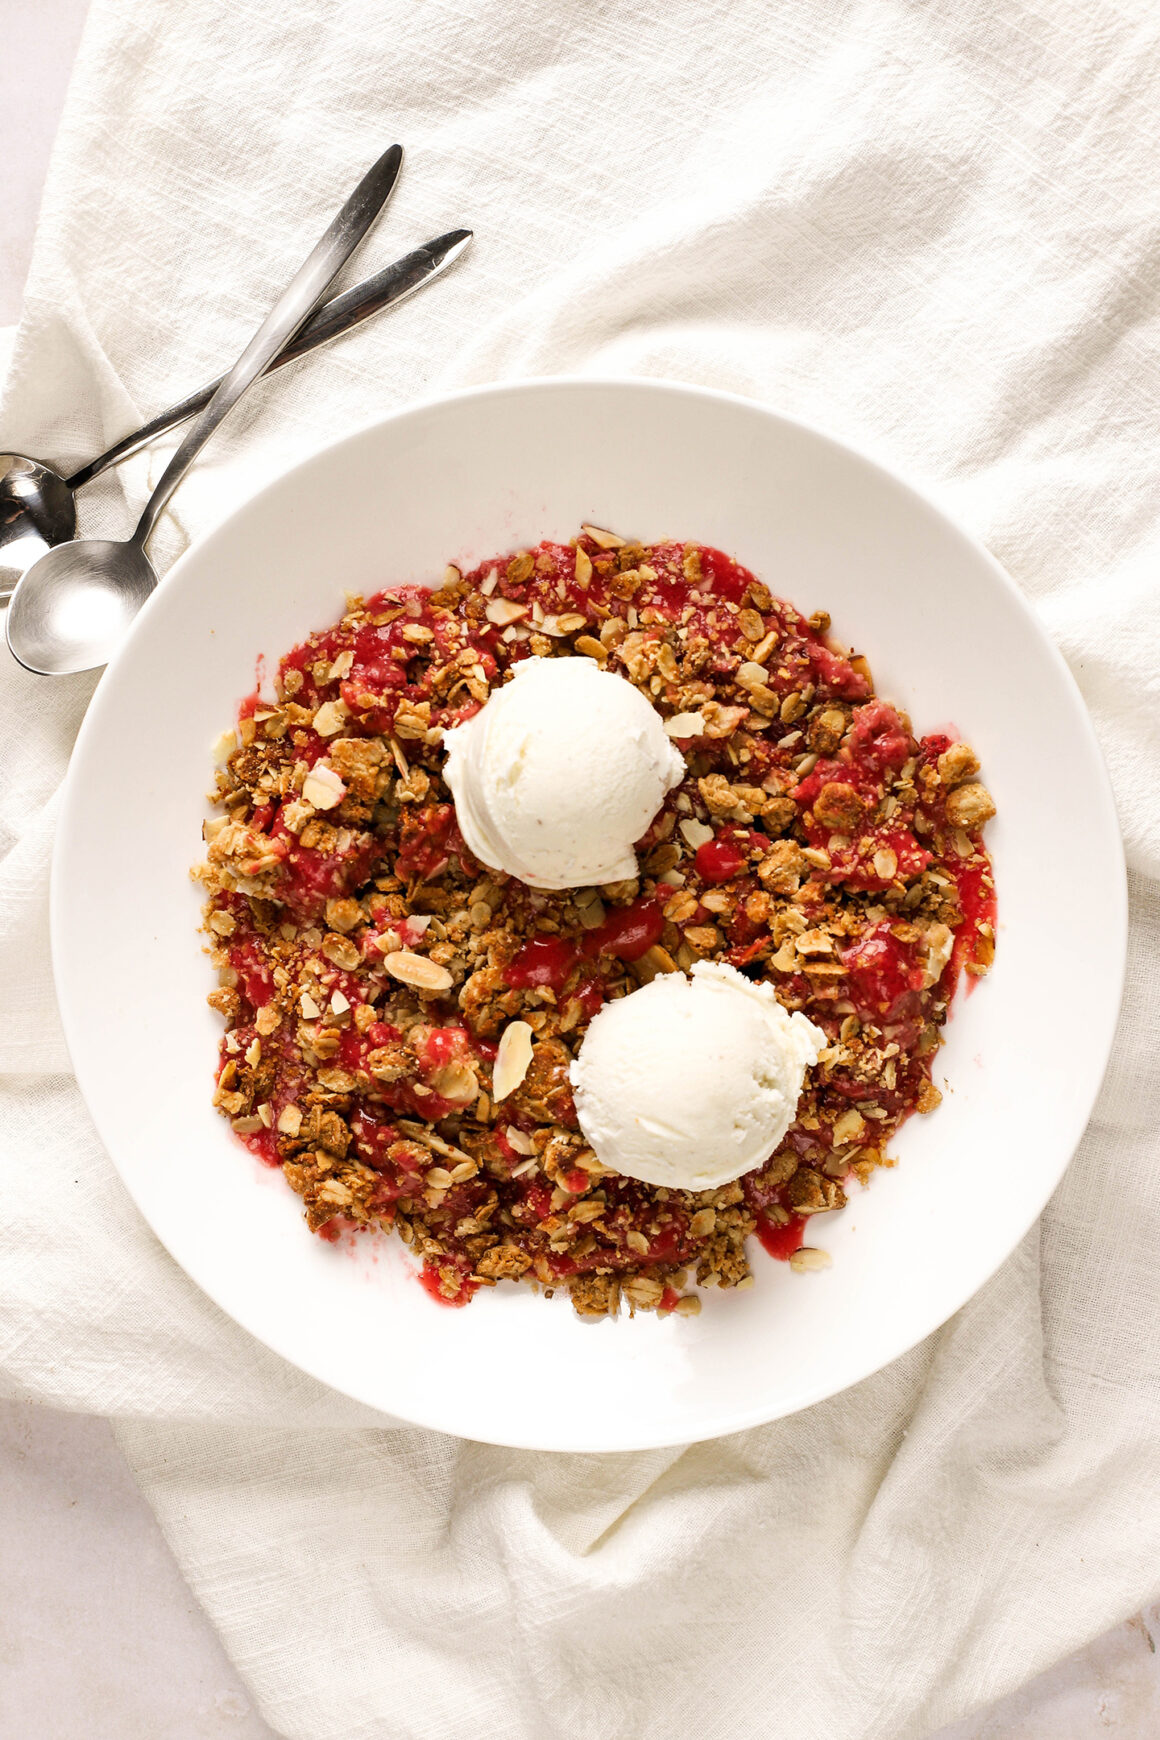 strawberry crisp in low bowl with vanilla bean ice cream